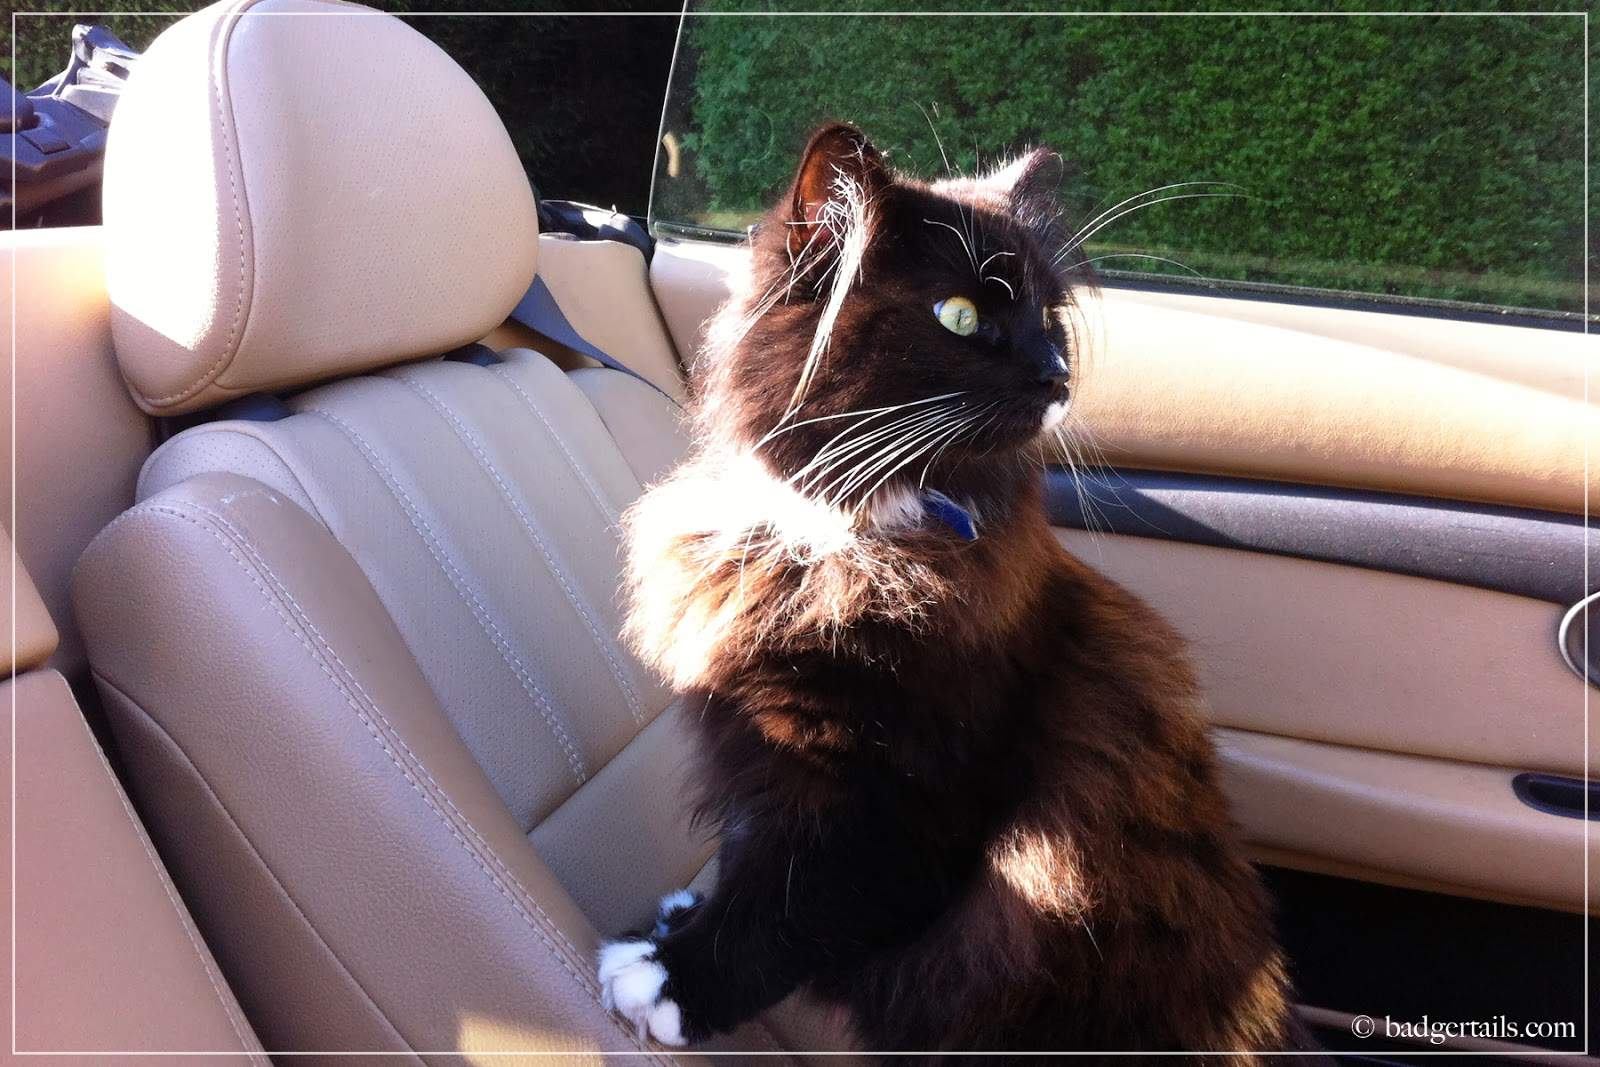 black cat in convertible car in summer